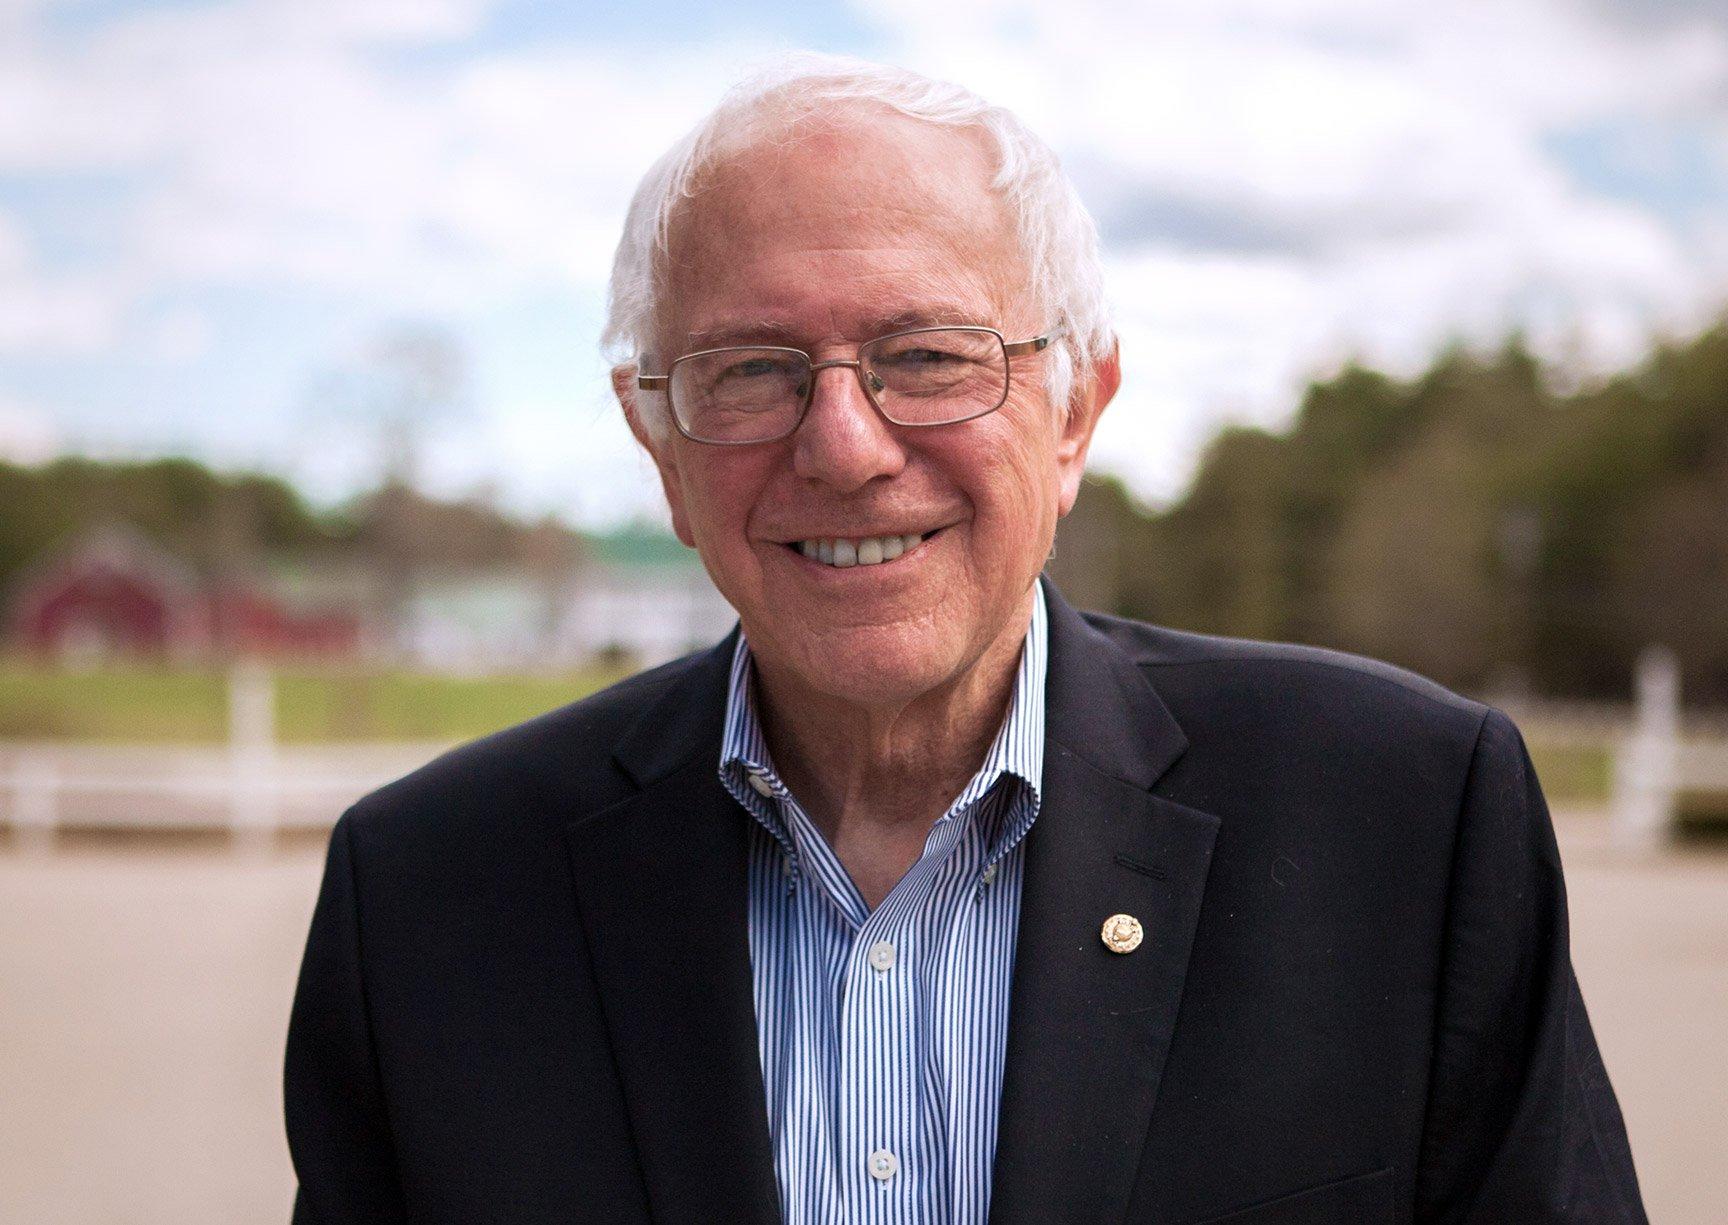 Bernie Sanders Election 16 Page MAIN_136726